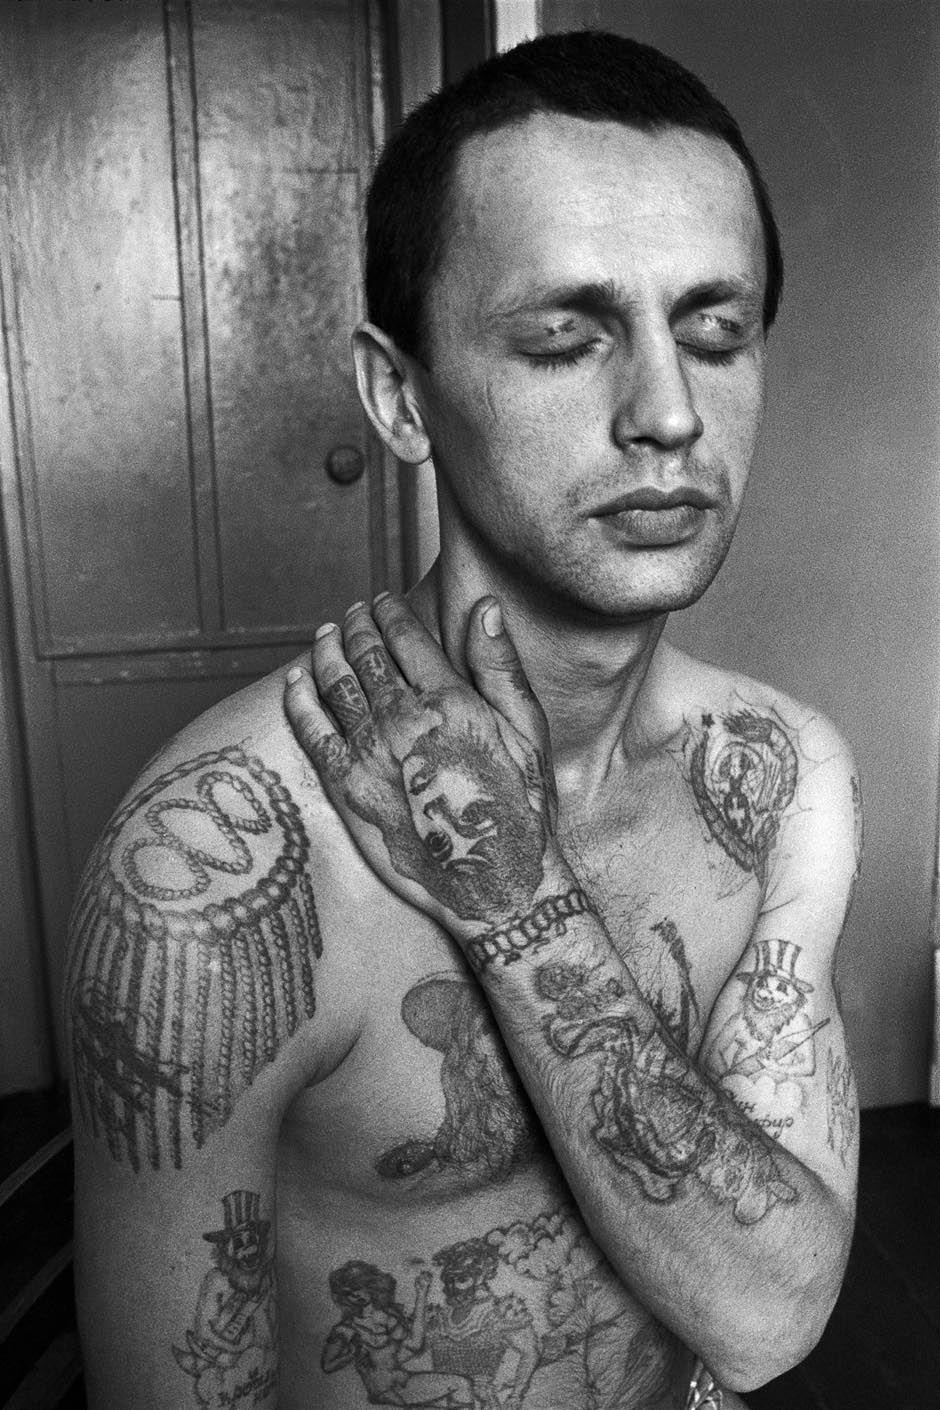 http://www.laboiteverte.fr/wp-content/uploads/2011/02/tatouage-encyclopedie-criminel-russe-prison-05.jpg